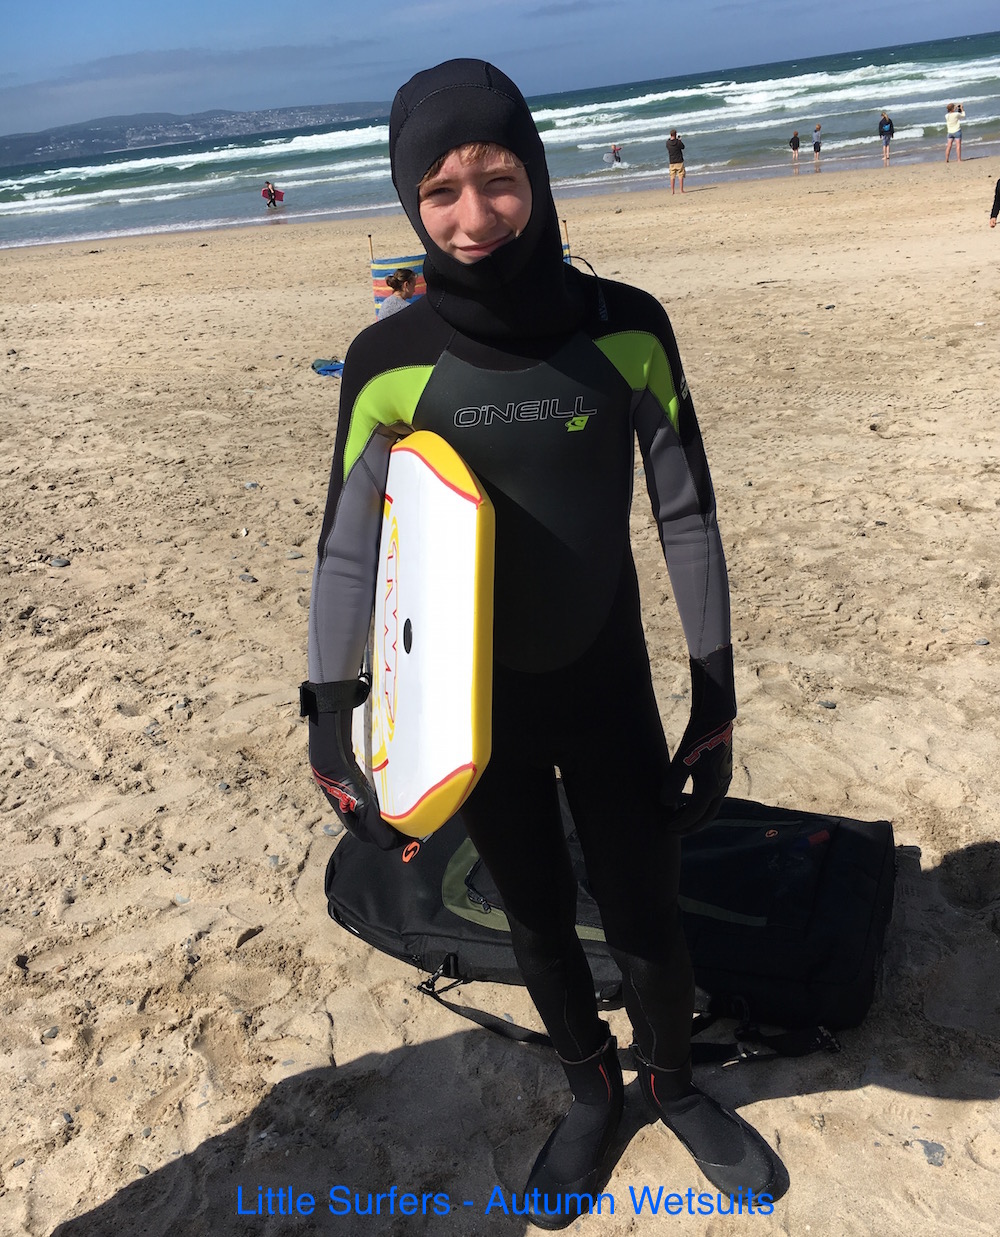 Autumn Wetsuit Guide